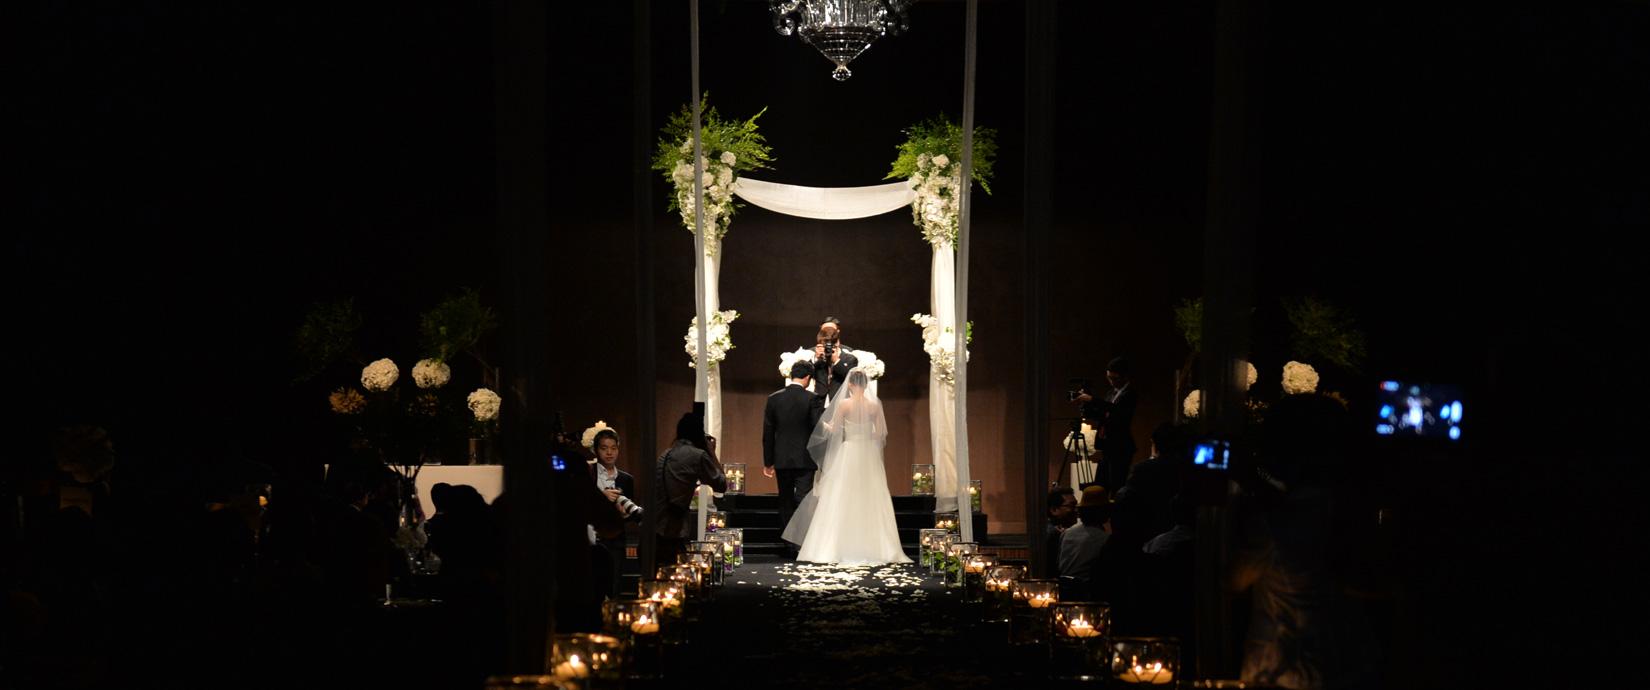 wedding gallery 29